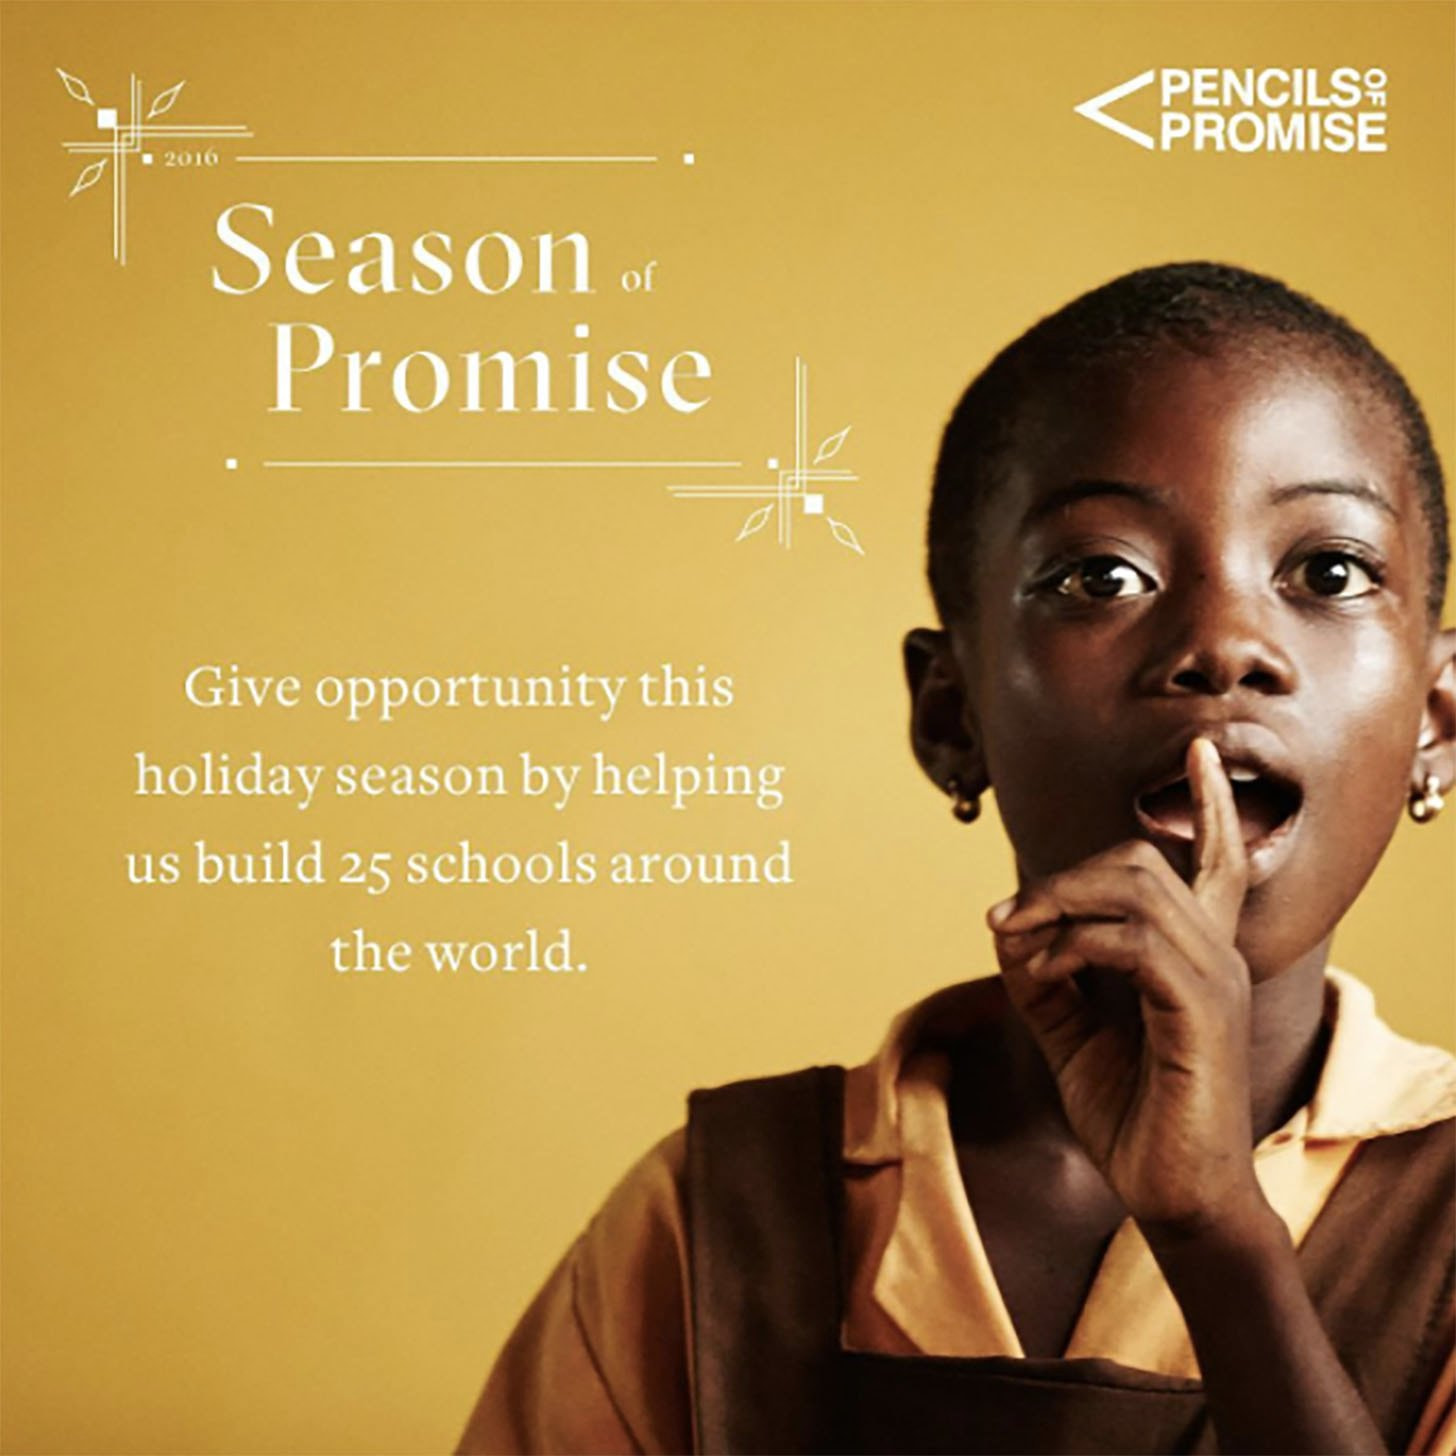 seasons of promise instagram graphic